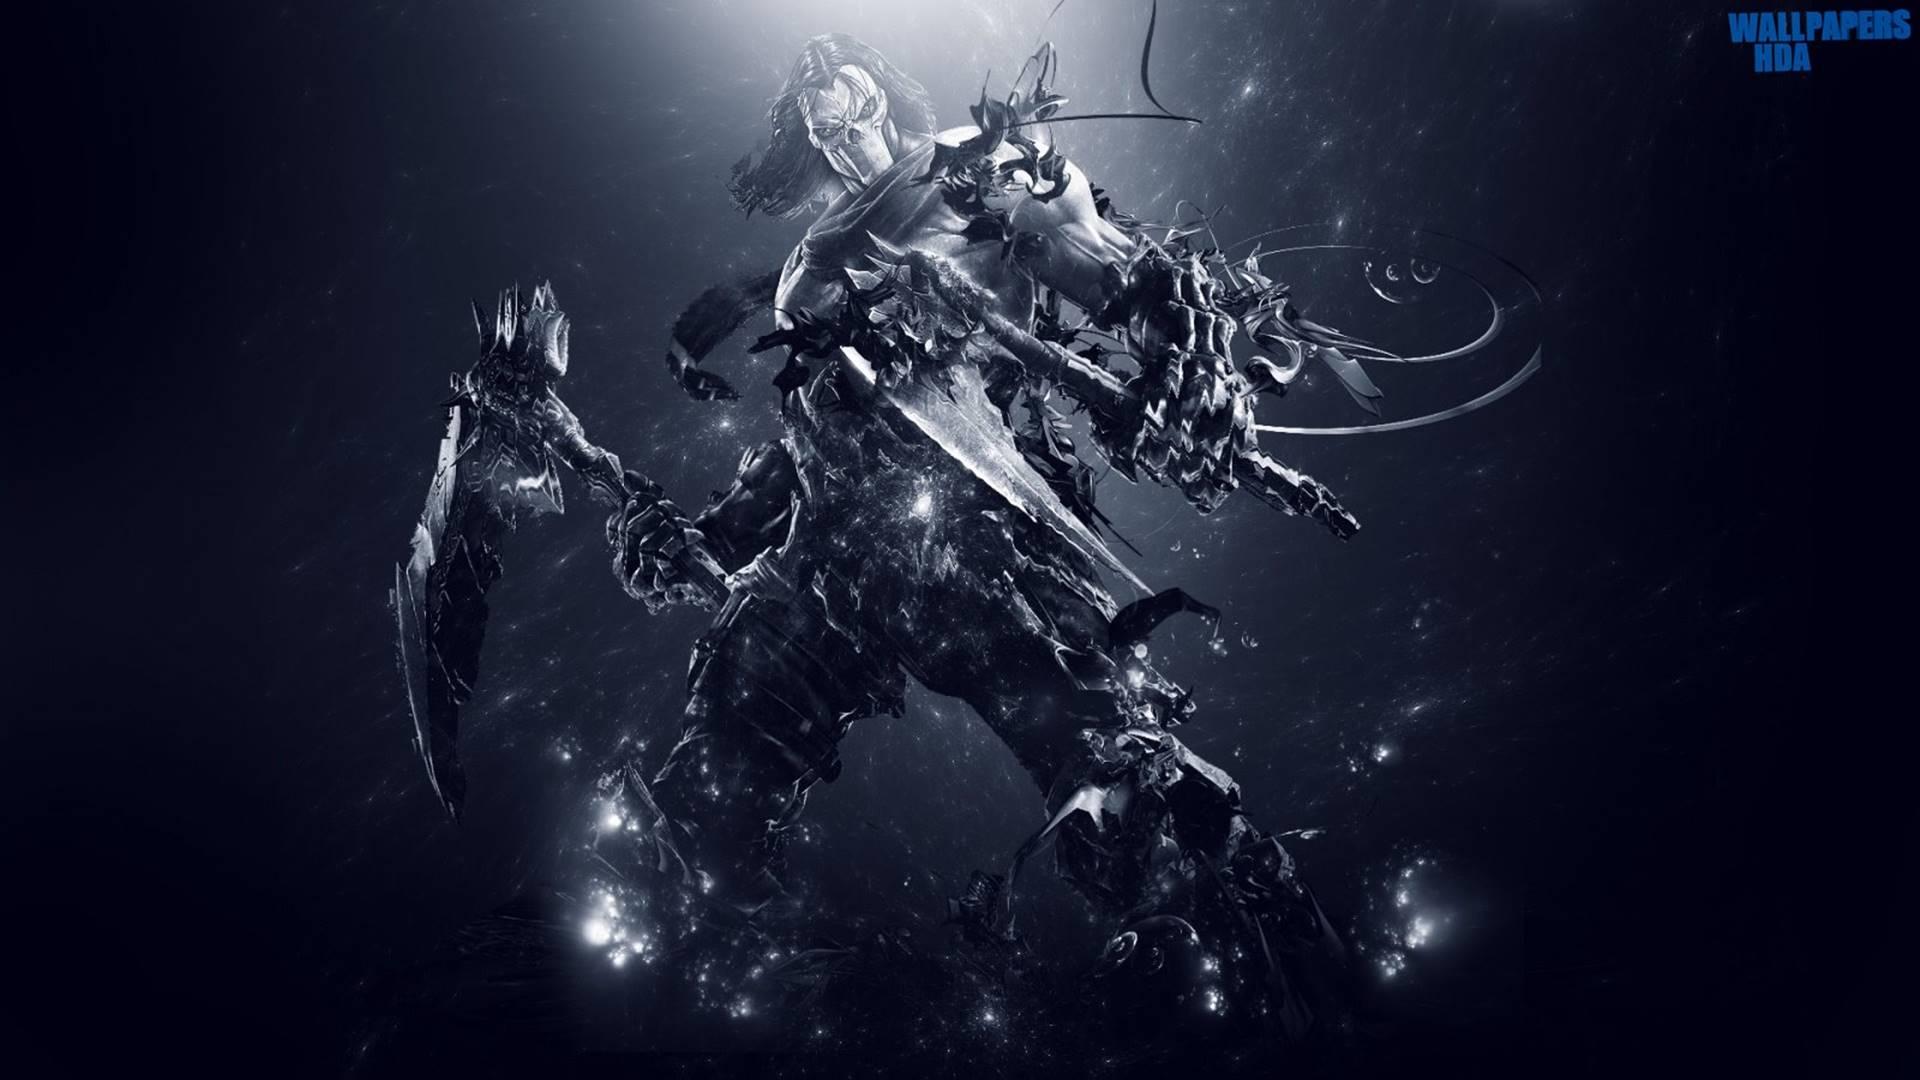 Darksiders 2 video game 19202151080 Wallpaper 2017 HD High 1920x1080